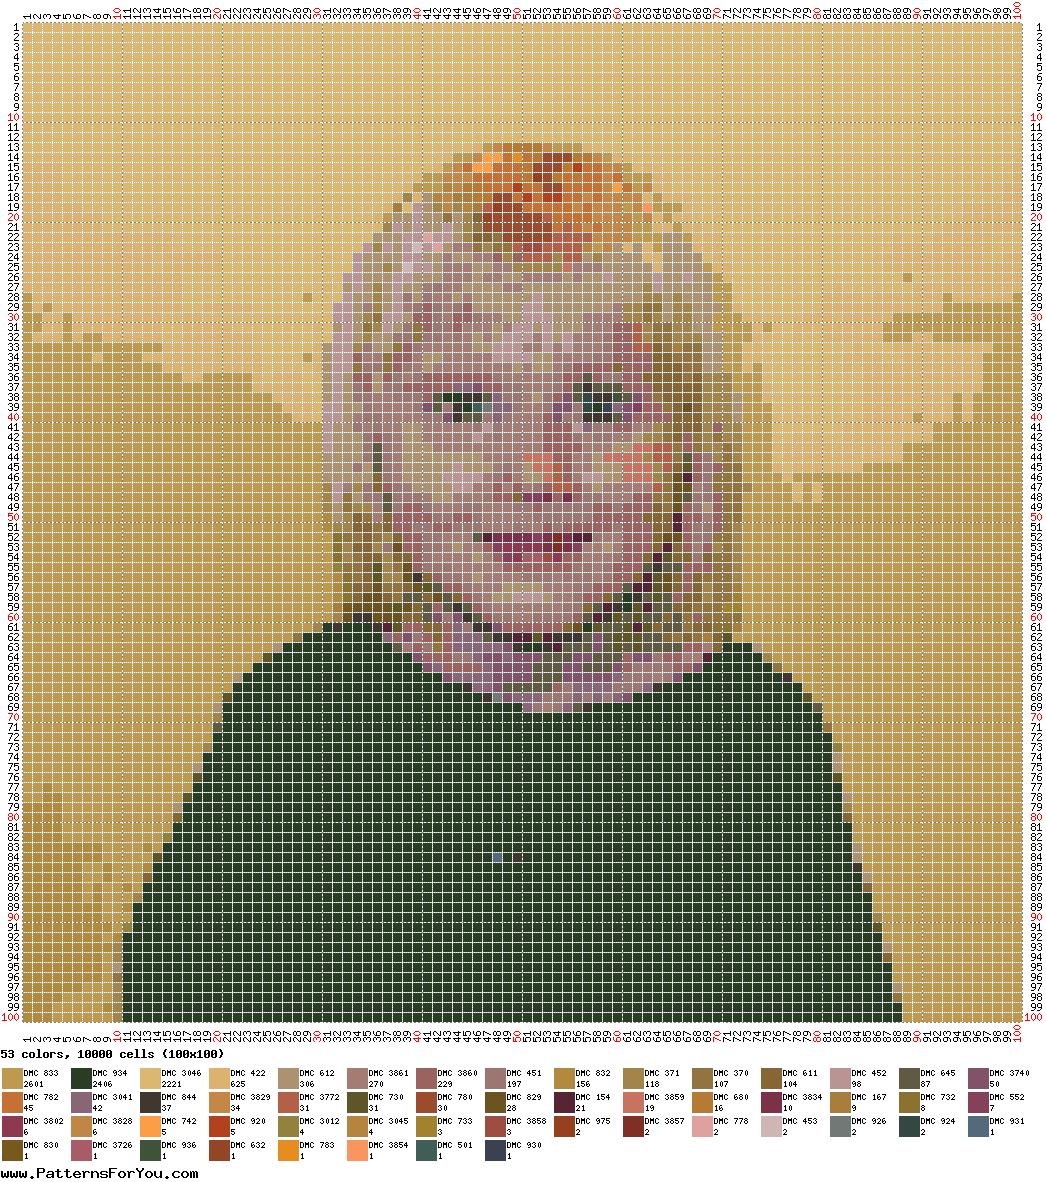 ivankashoshana pattern2